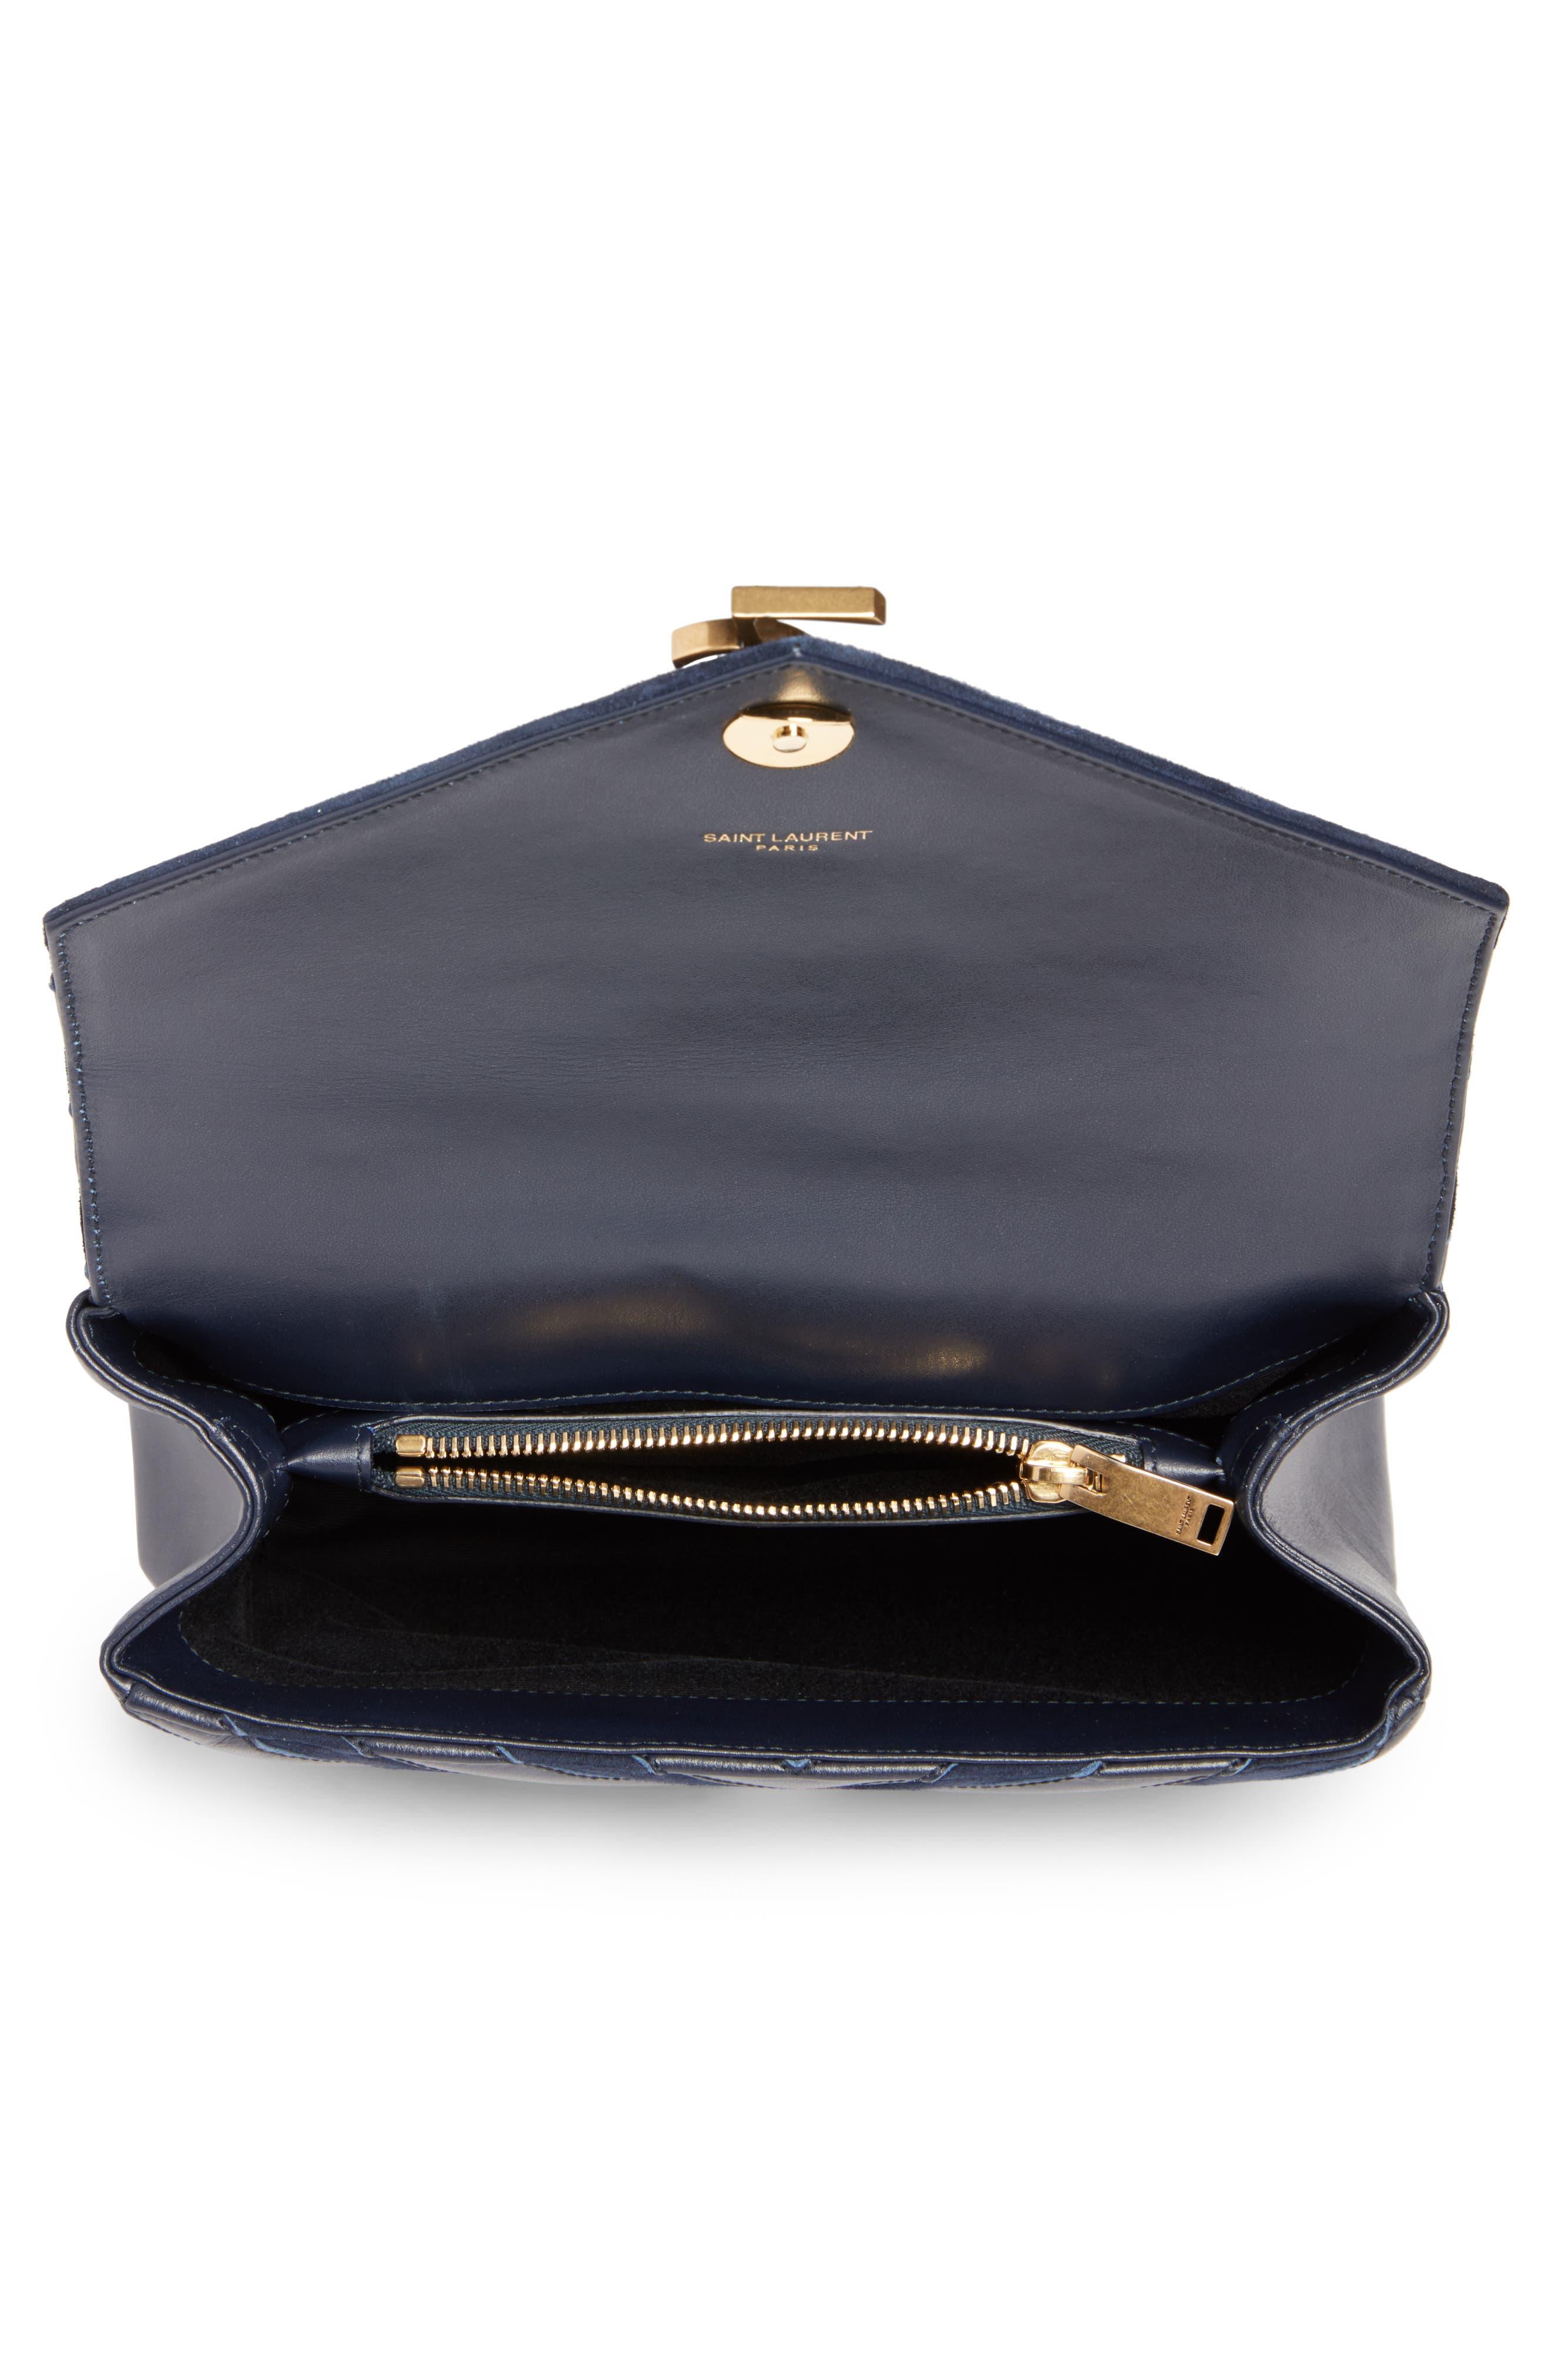 Medium College Patchwork Suede & Leather Shoulder Bag,                             Alternate thumbnail 4, color,                             Deep Marine